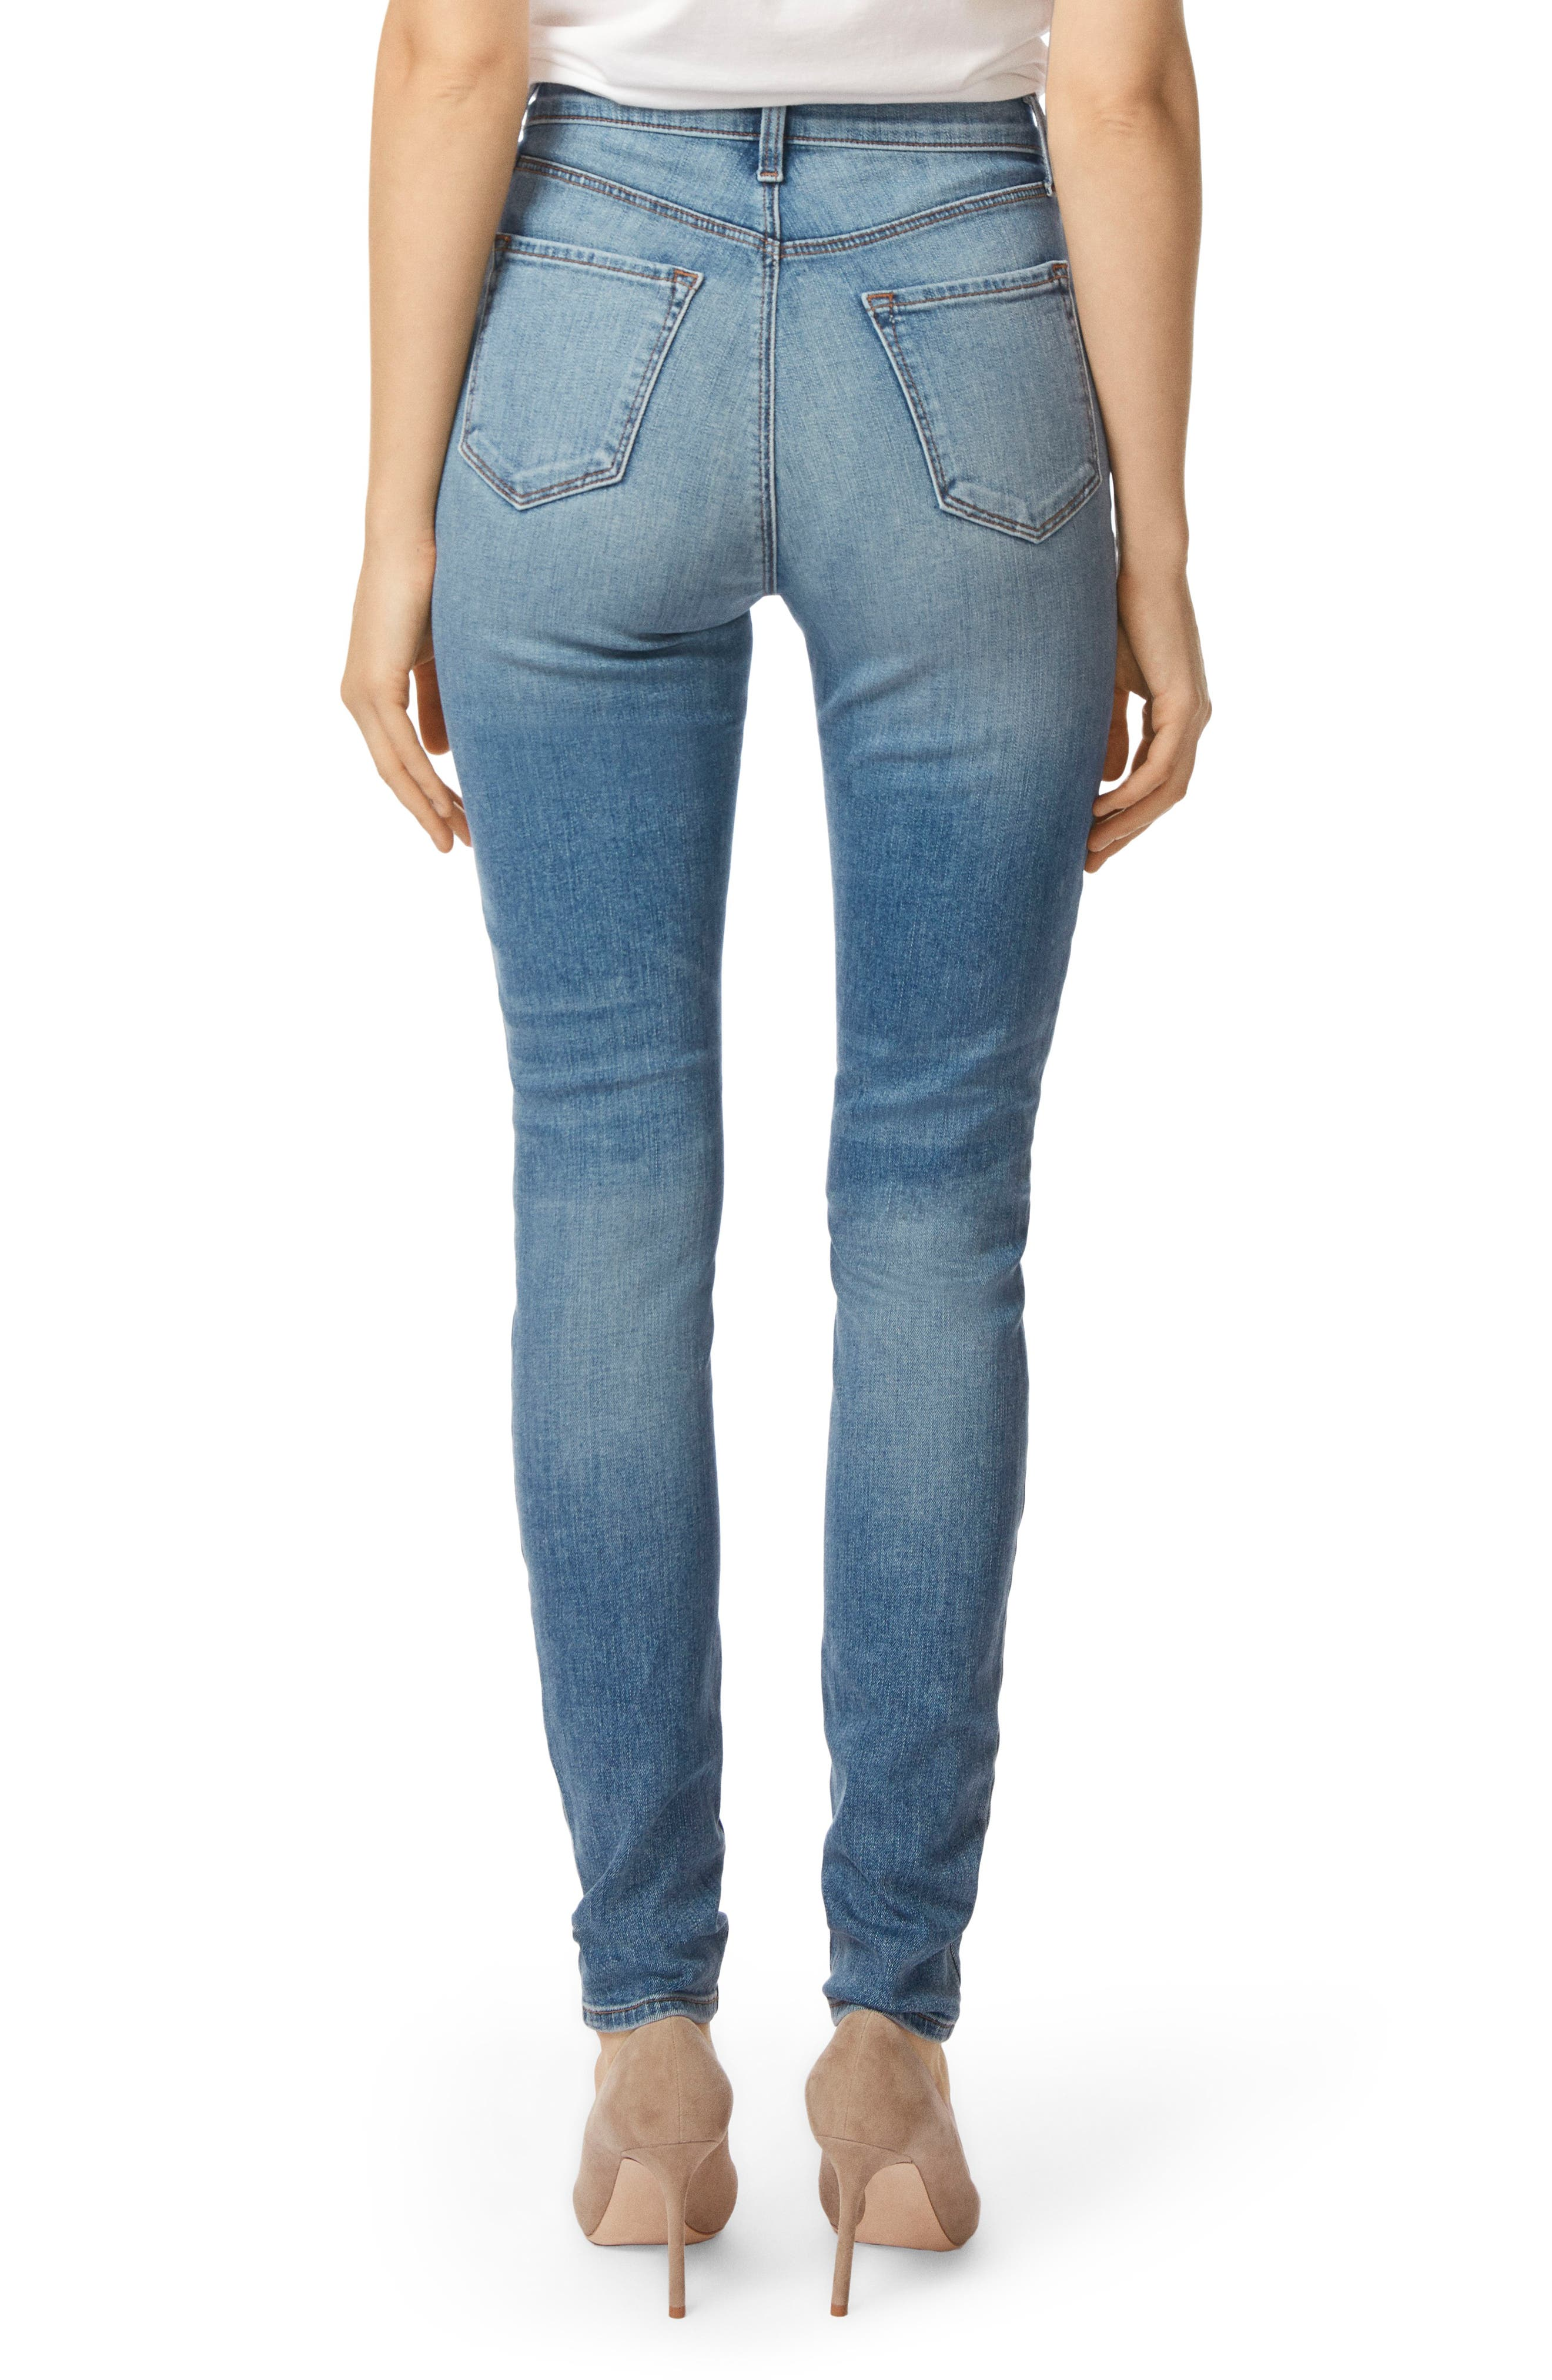 Carolina Super High Waist Skinny Jeans,                             Alternate thumbnail 2, color,                             400